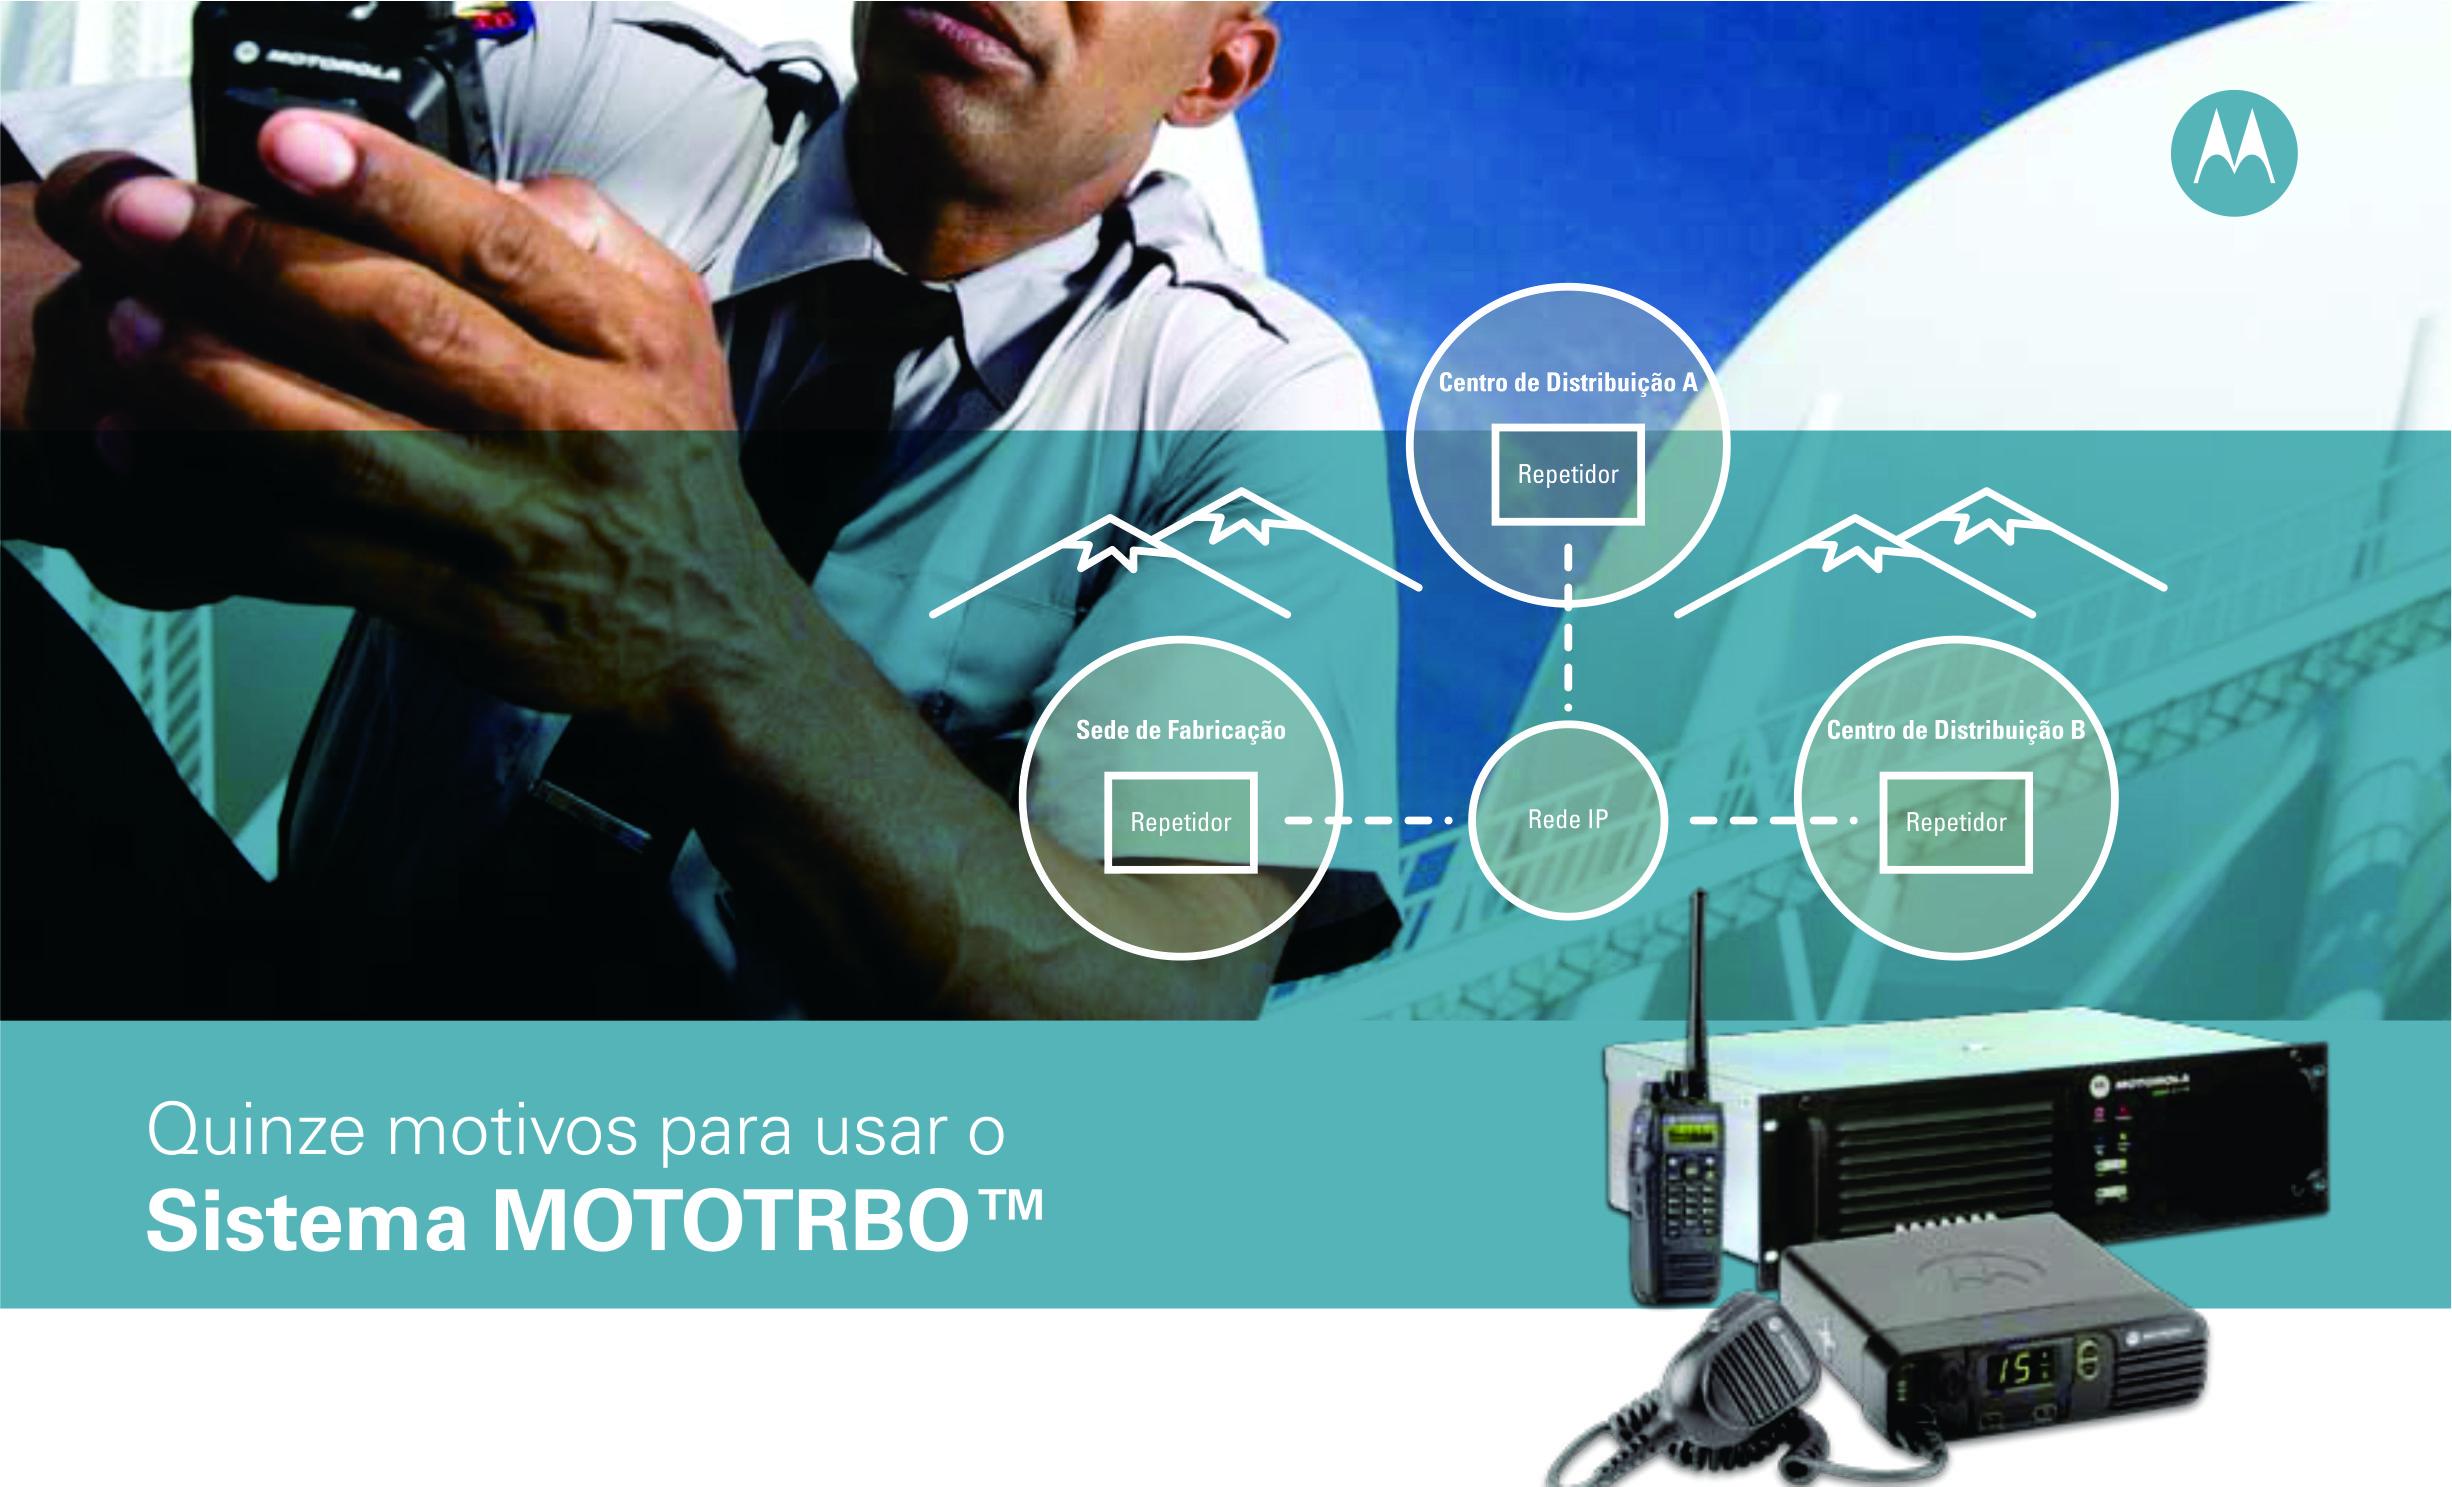 15 motivos para usar o sistema Mototrbo